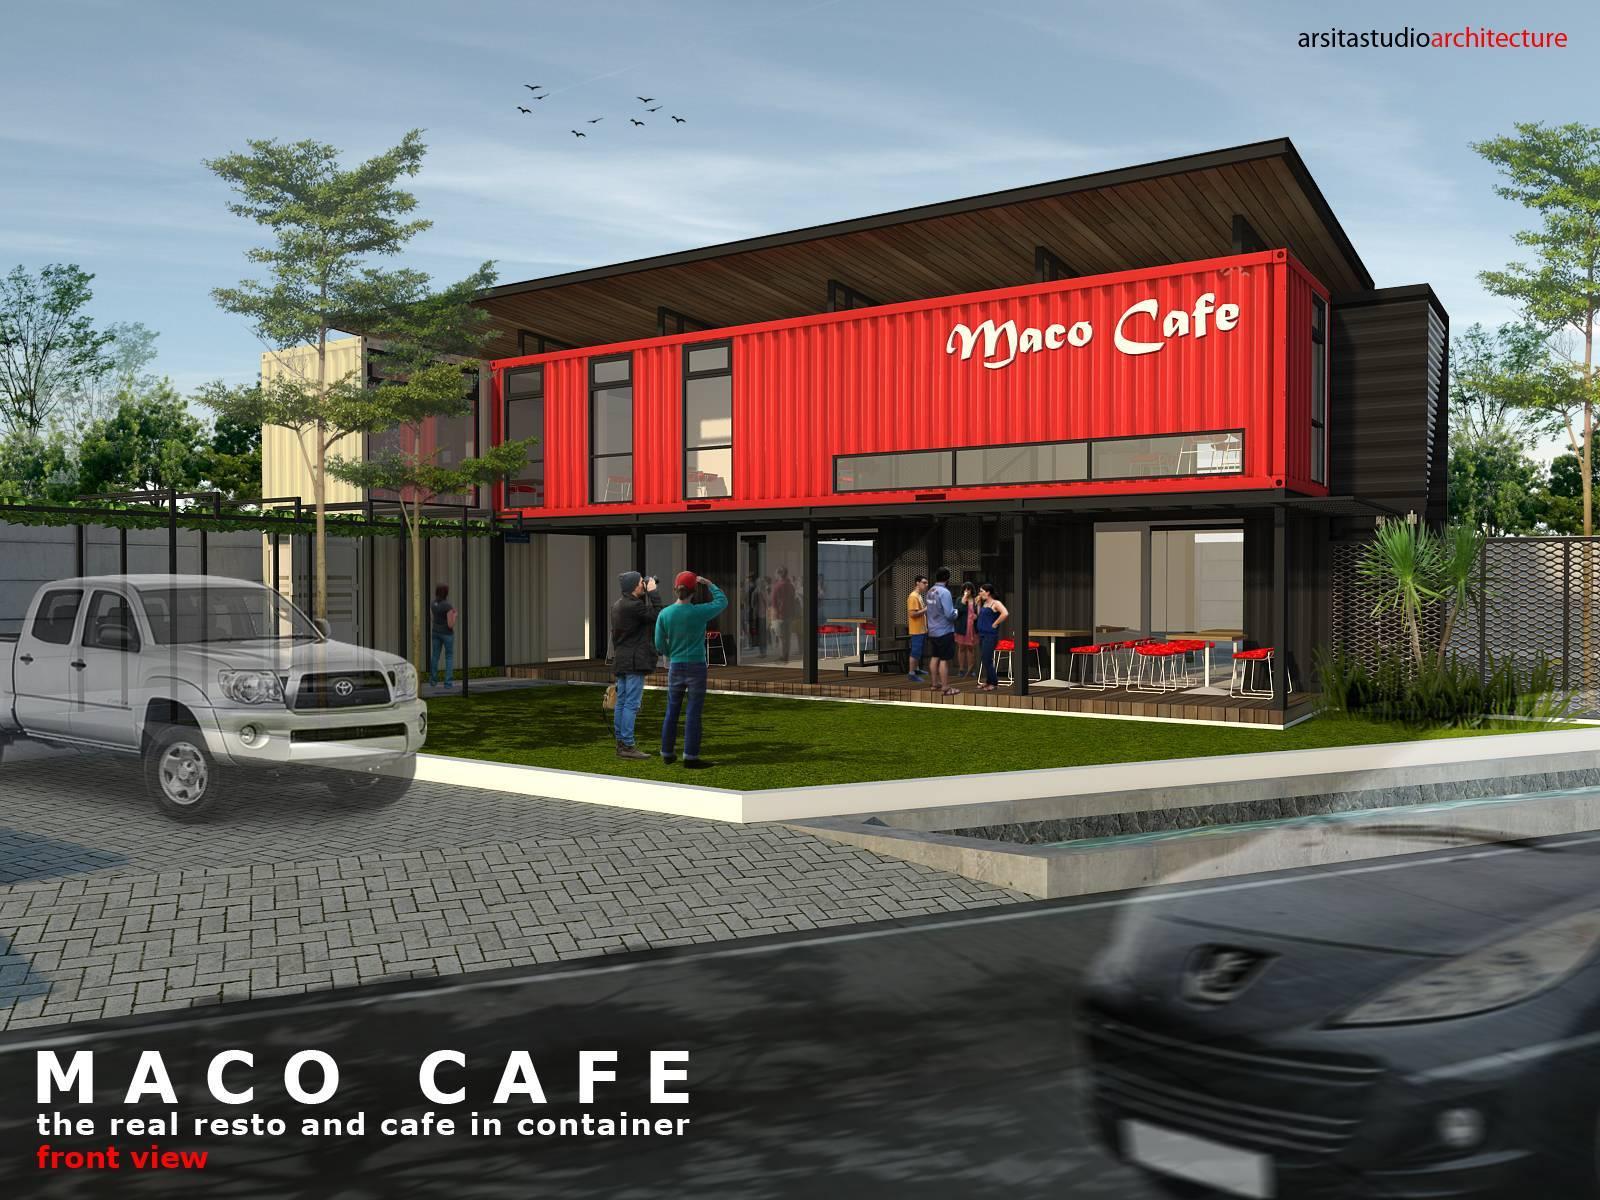 Arsita Studio Architecture Maco Cafe Gresik, Jawa Timur Gresik, Jawa Timur Maco-Cafe-Front-View Industrial  3282